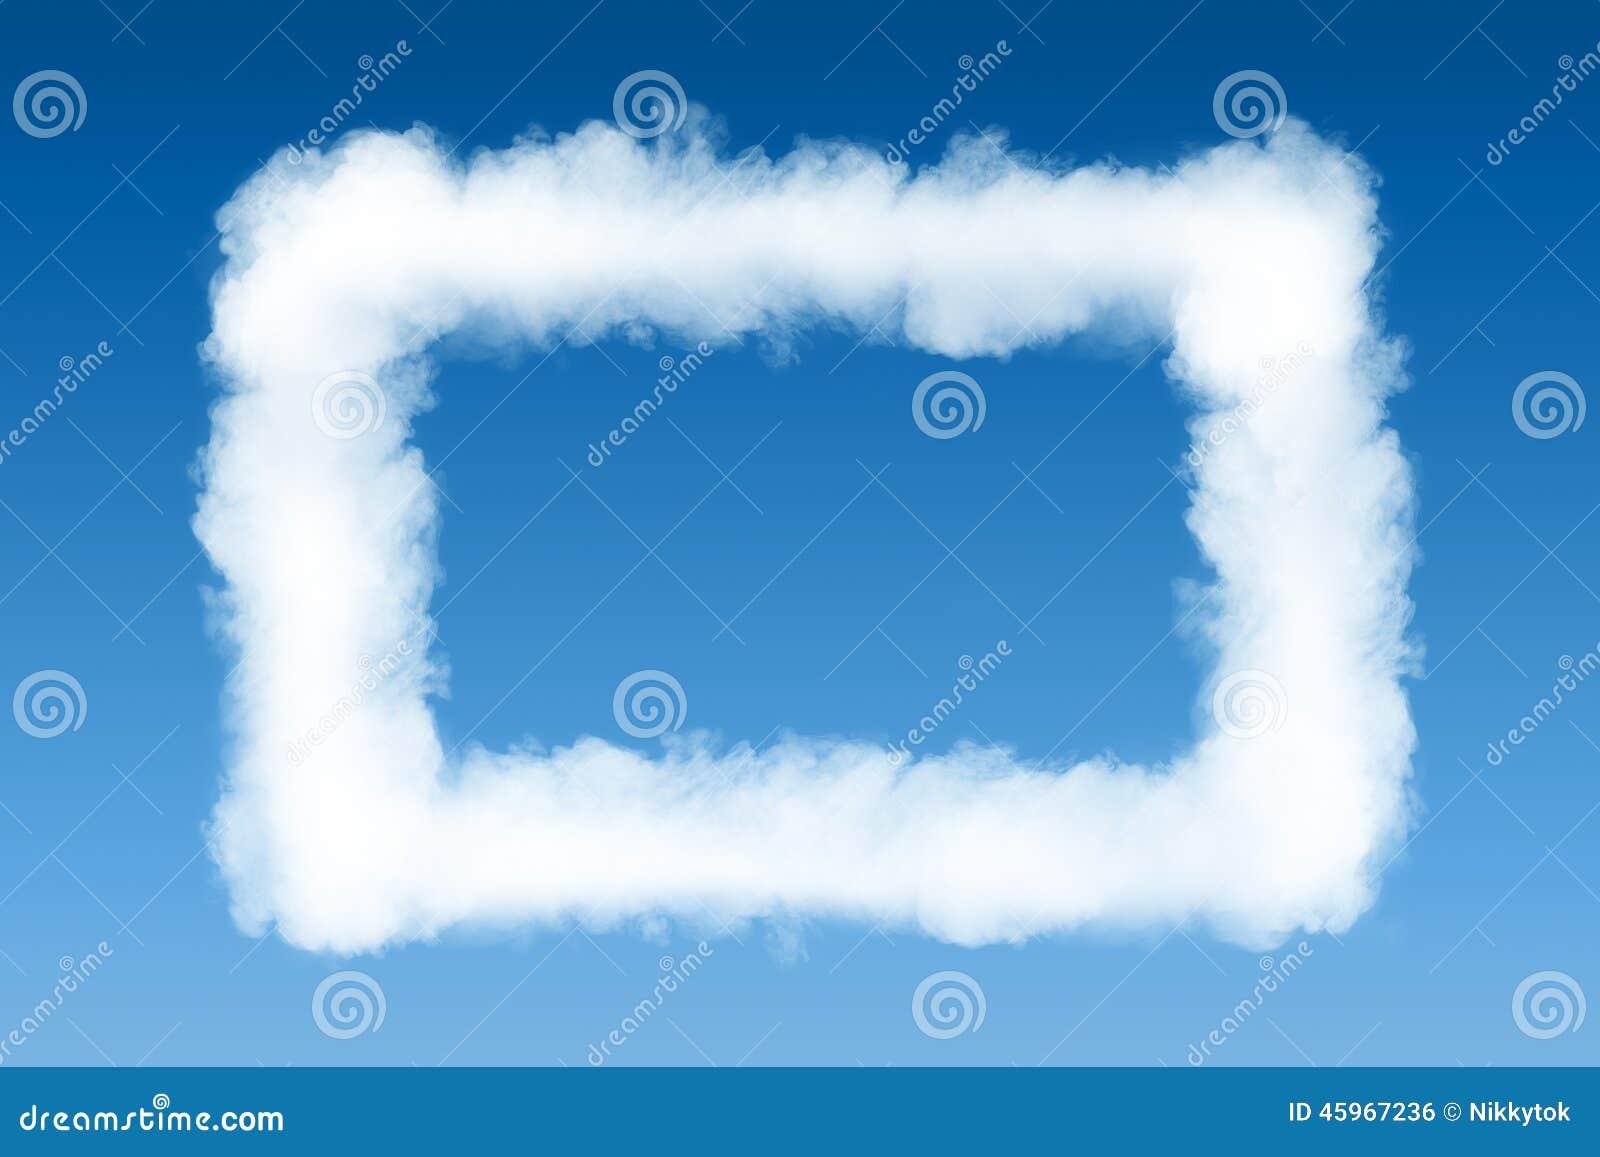 Smoke cloud frame stock photo. Image of blow, close, cloud - 50616340